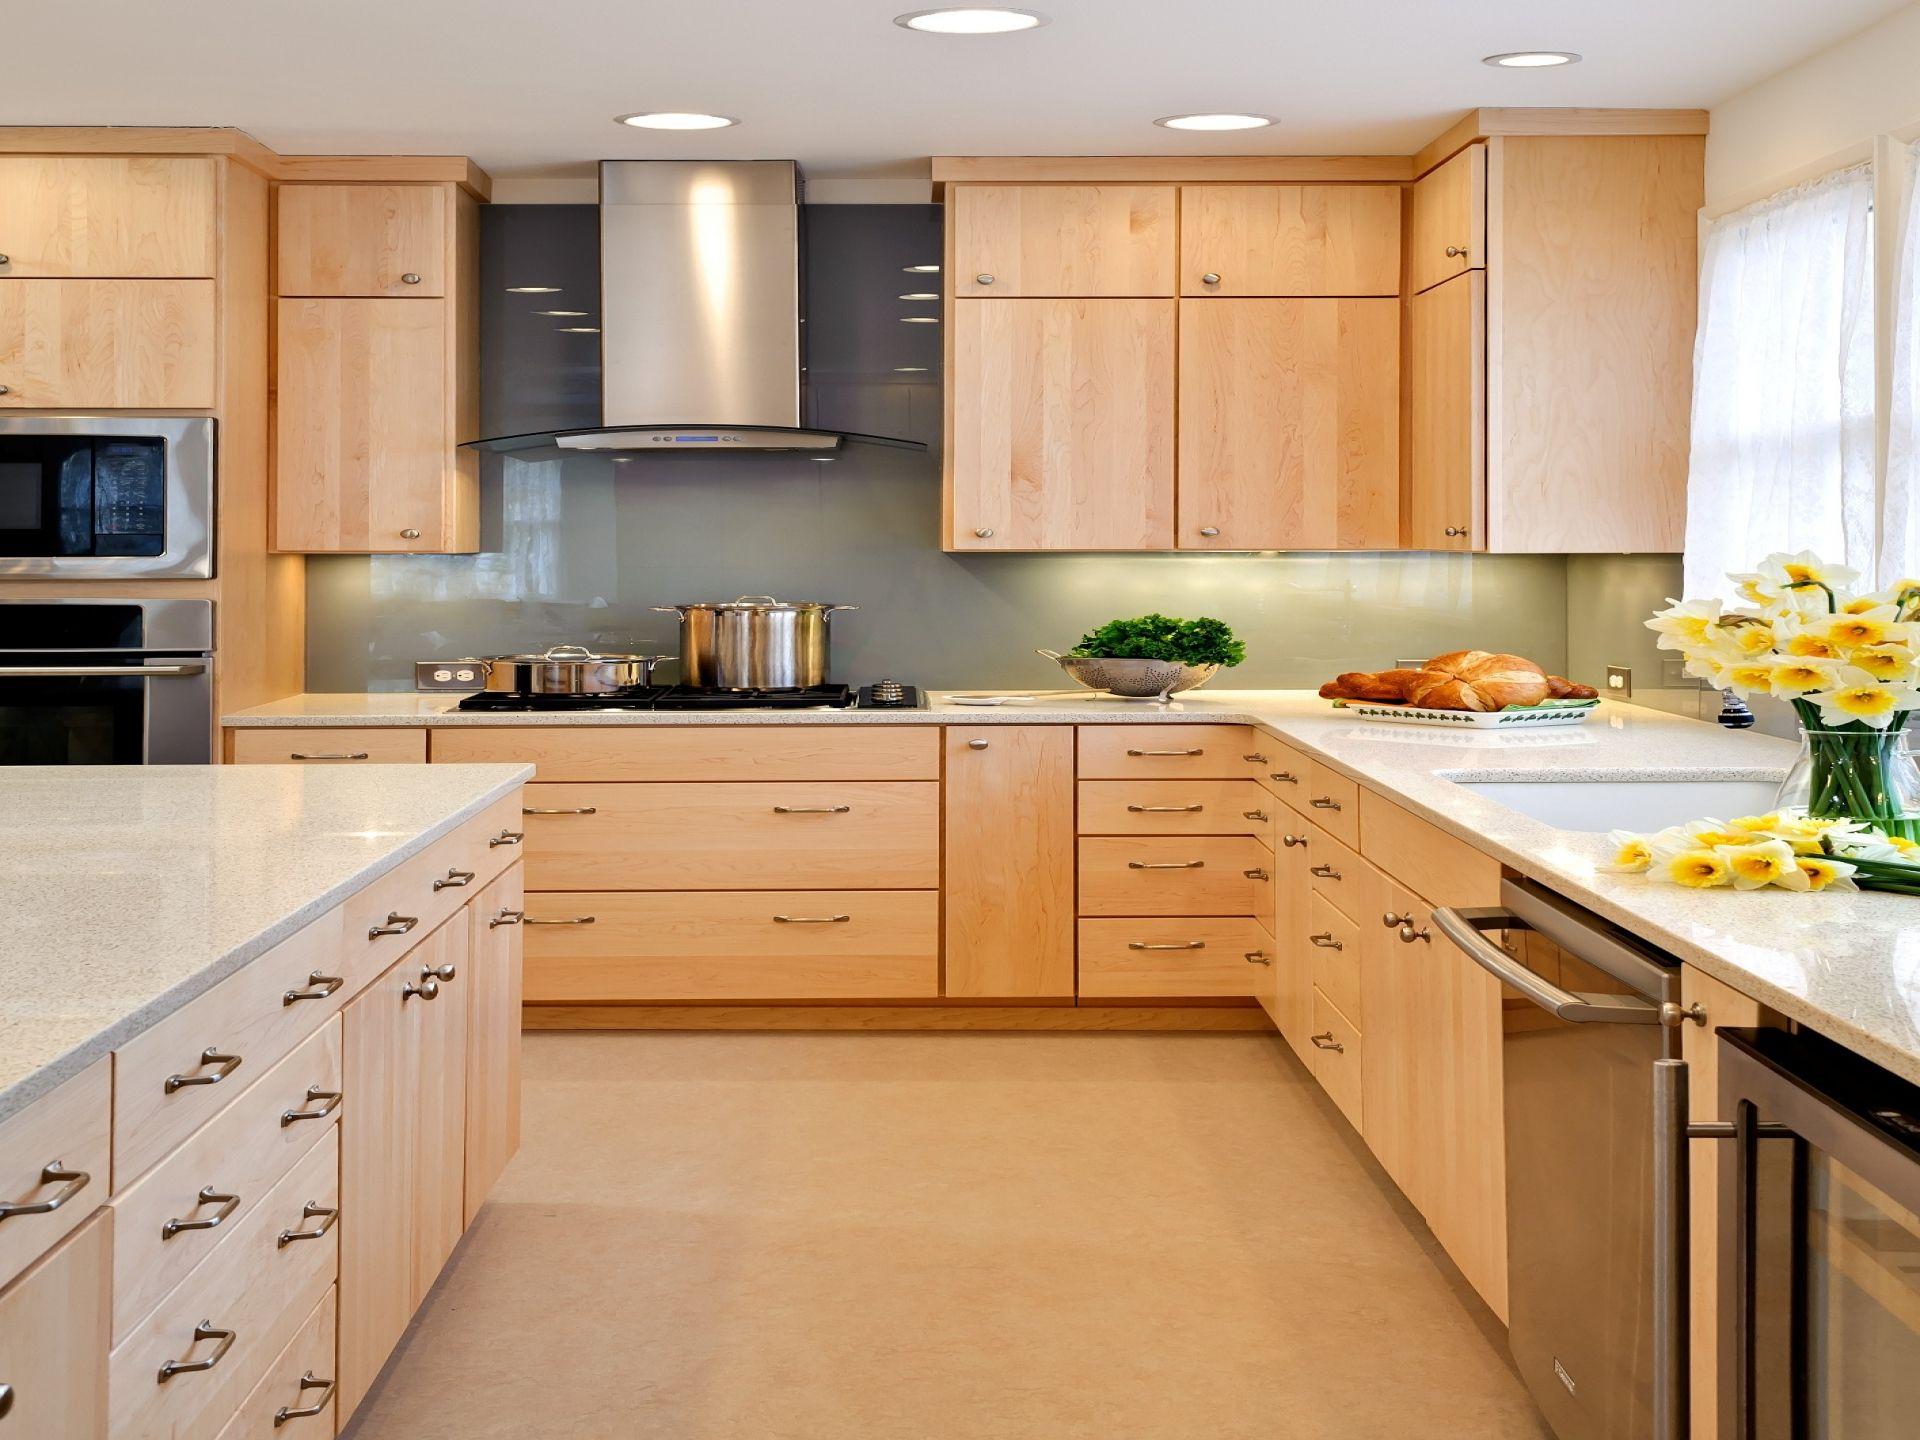 maple kitchen cabinets Natural Maple Kitchen Cabinets Design Inspiration Kitchen